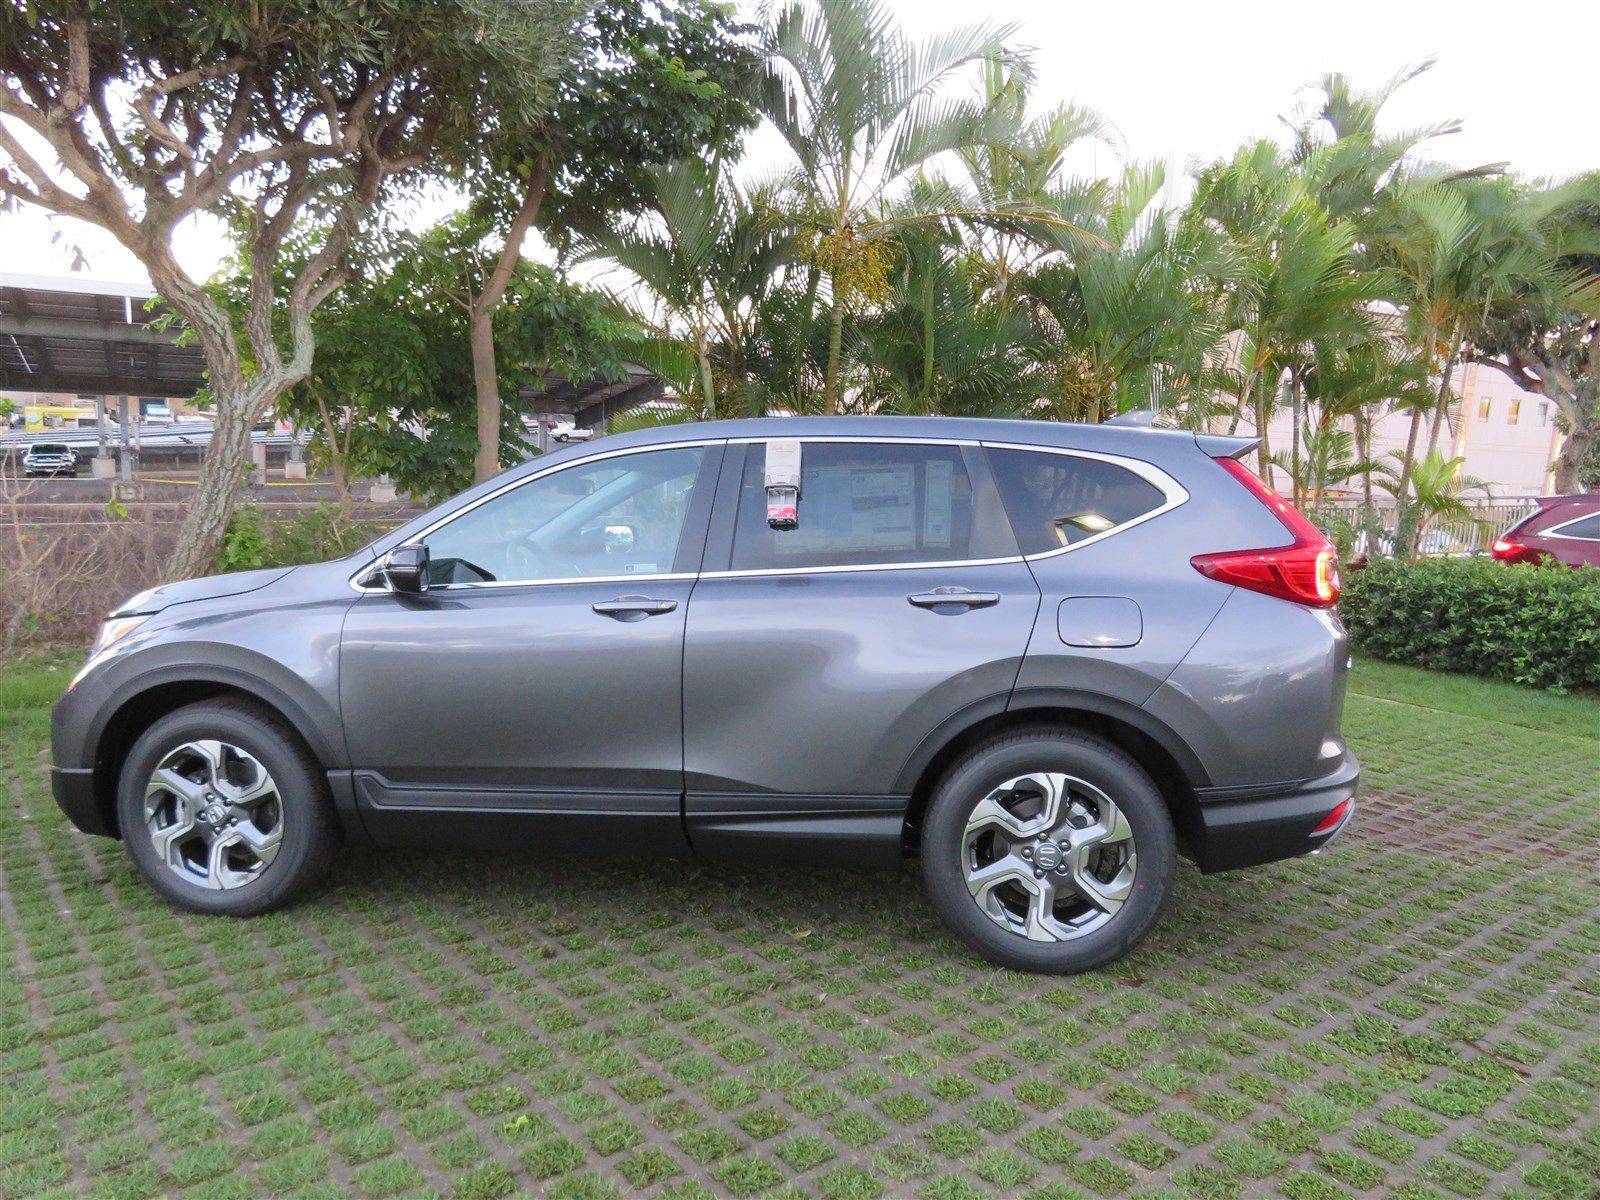 New 2018 Honda CR-V EX AWD For Sale in Greater Honolulu area, Kaneohe,  Waipahu, Hawaii   H182231